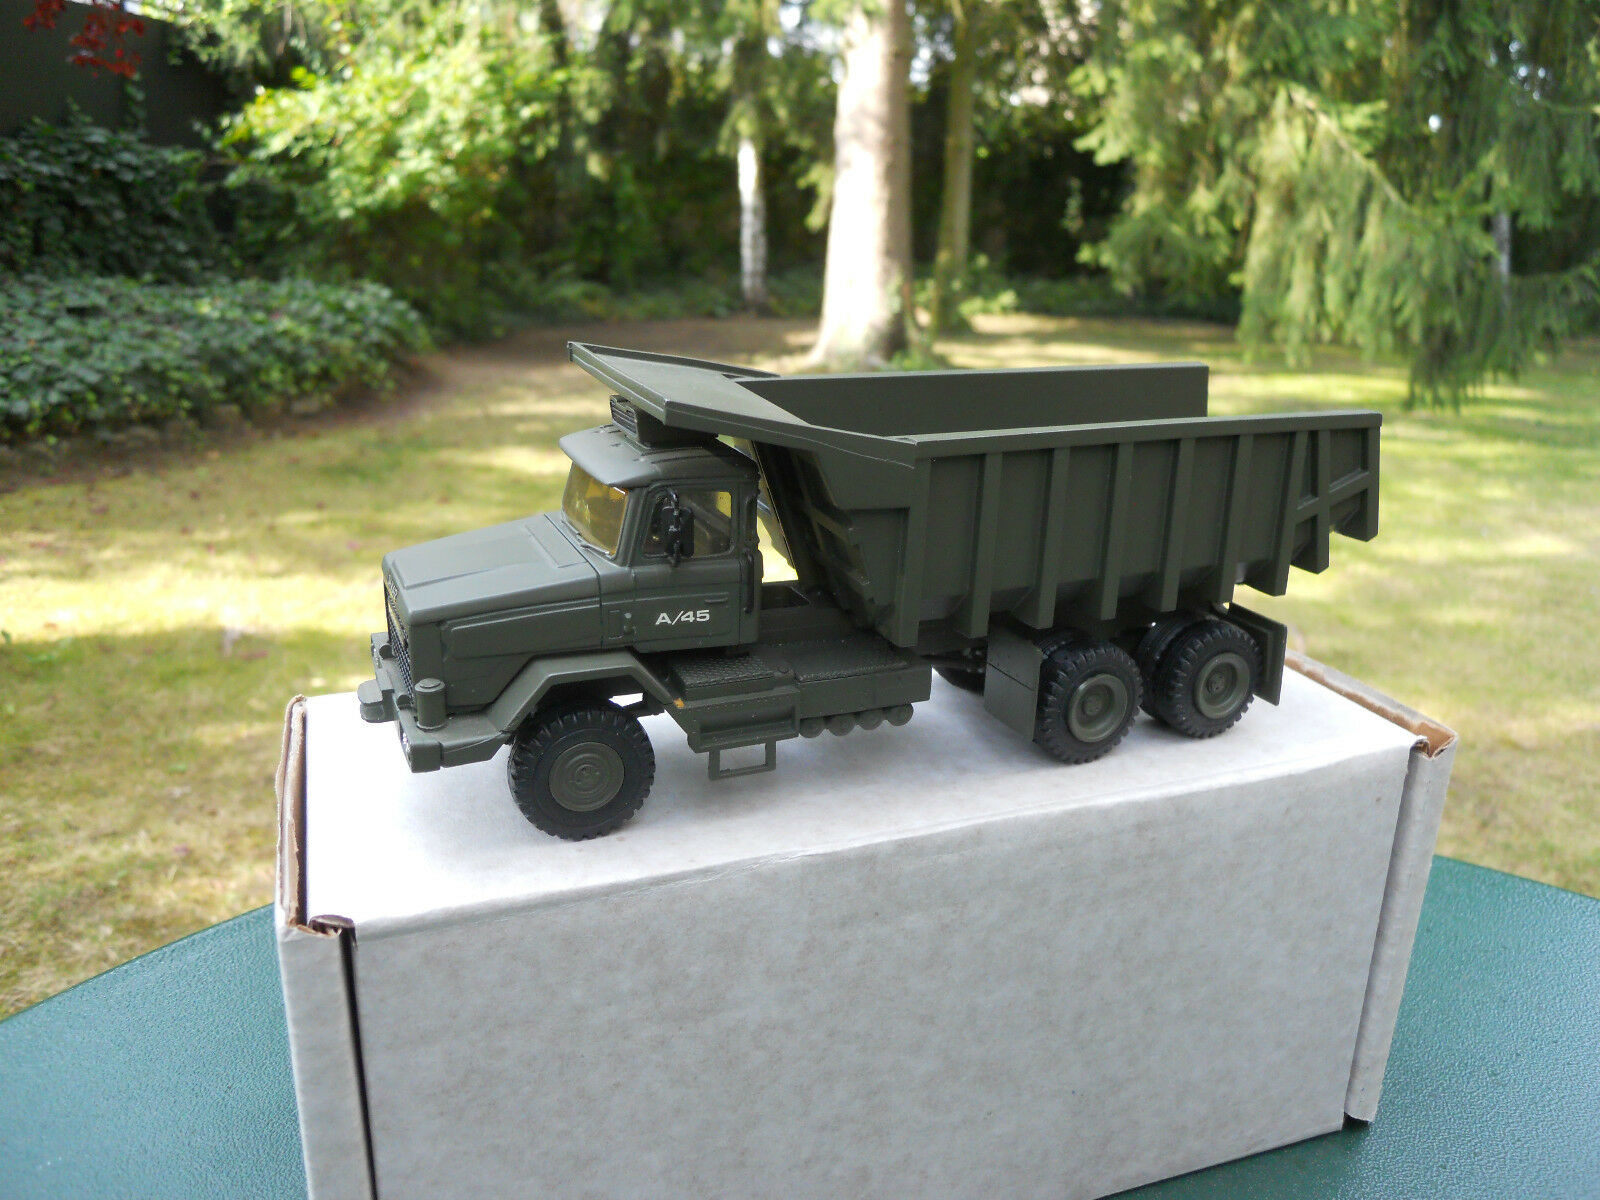 VEHICLE MILITARY ASAM REF ROC 99 SCAMMEL S 24 6X6 DUMPER BRITISH ARMY